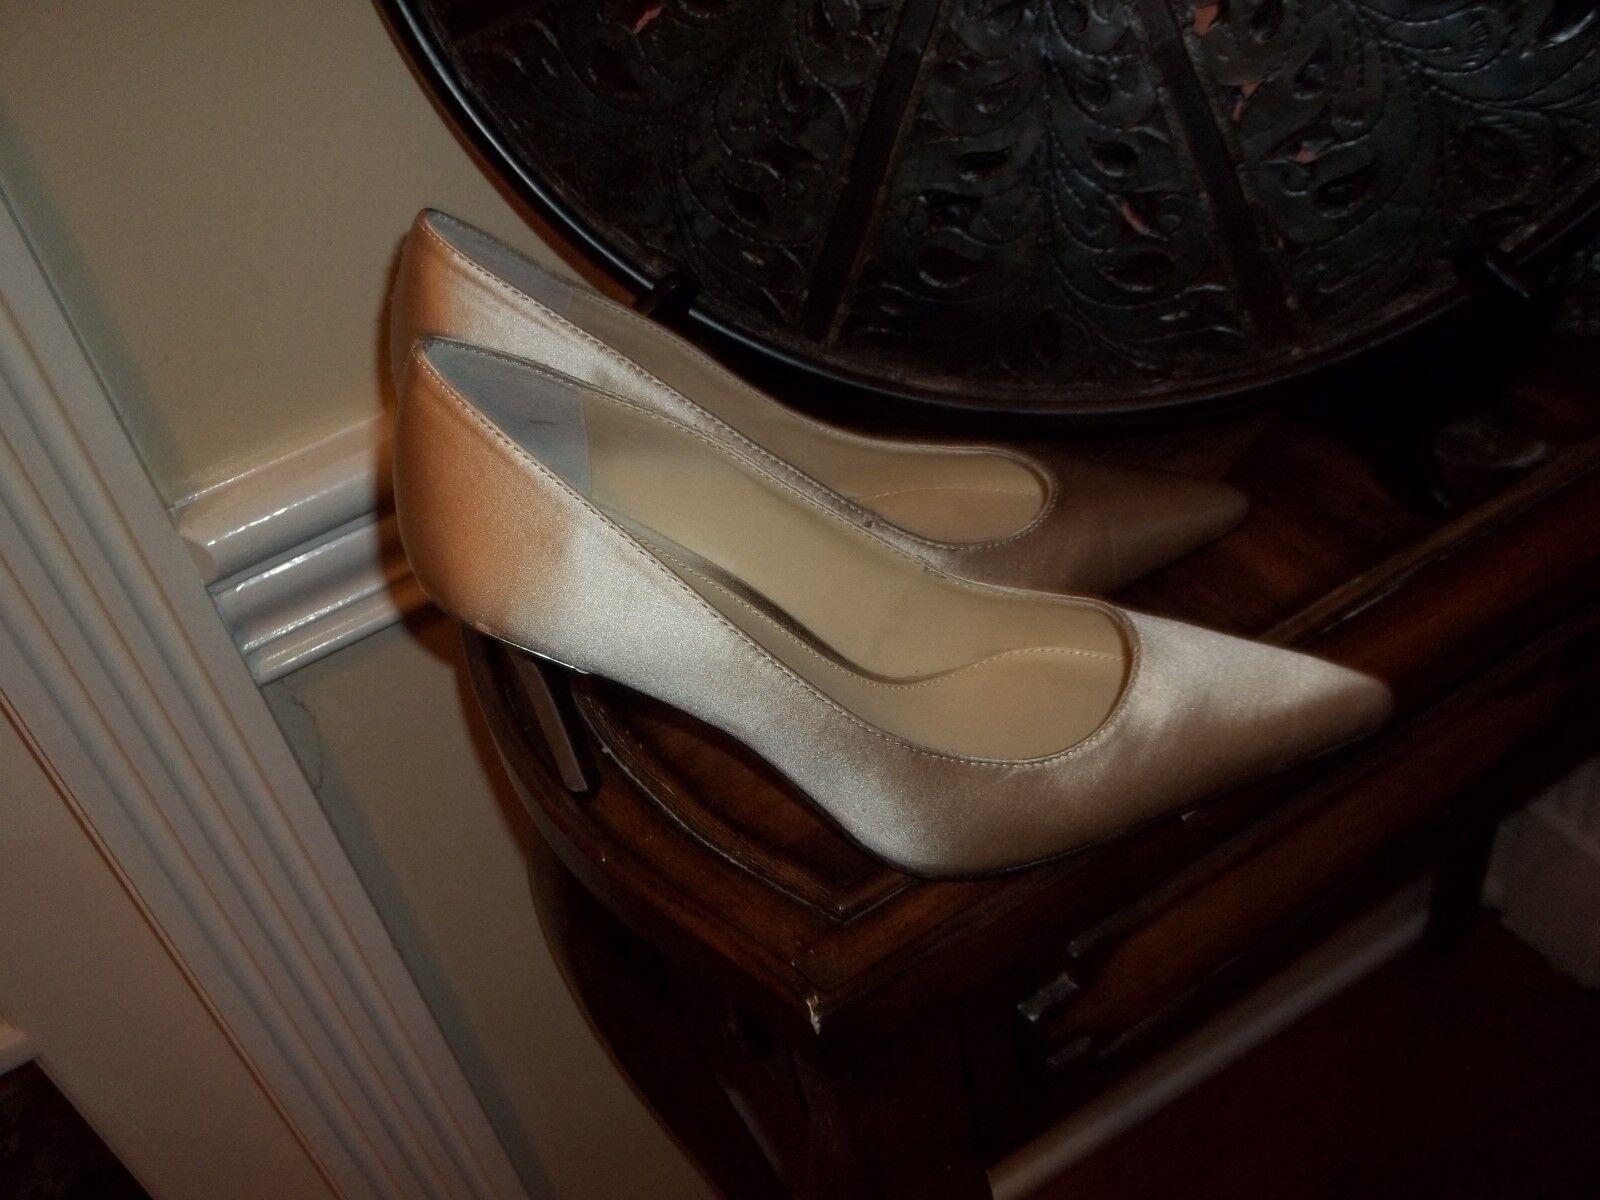 New Ralph Ralph Ralph Lauren Sarina Champagne Satin High Heel shoes 10M da1cfe